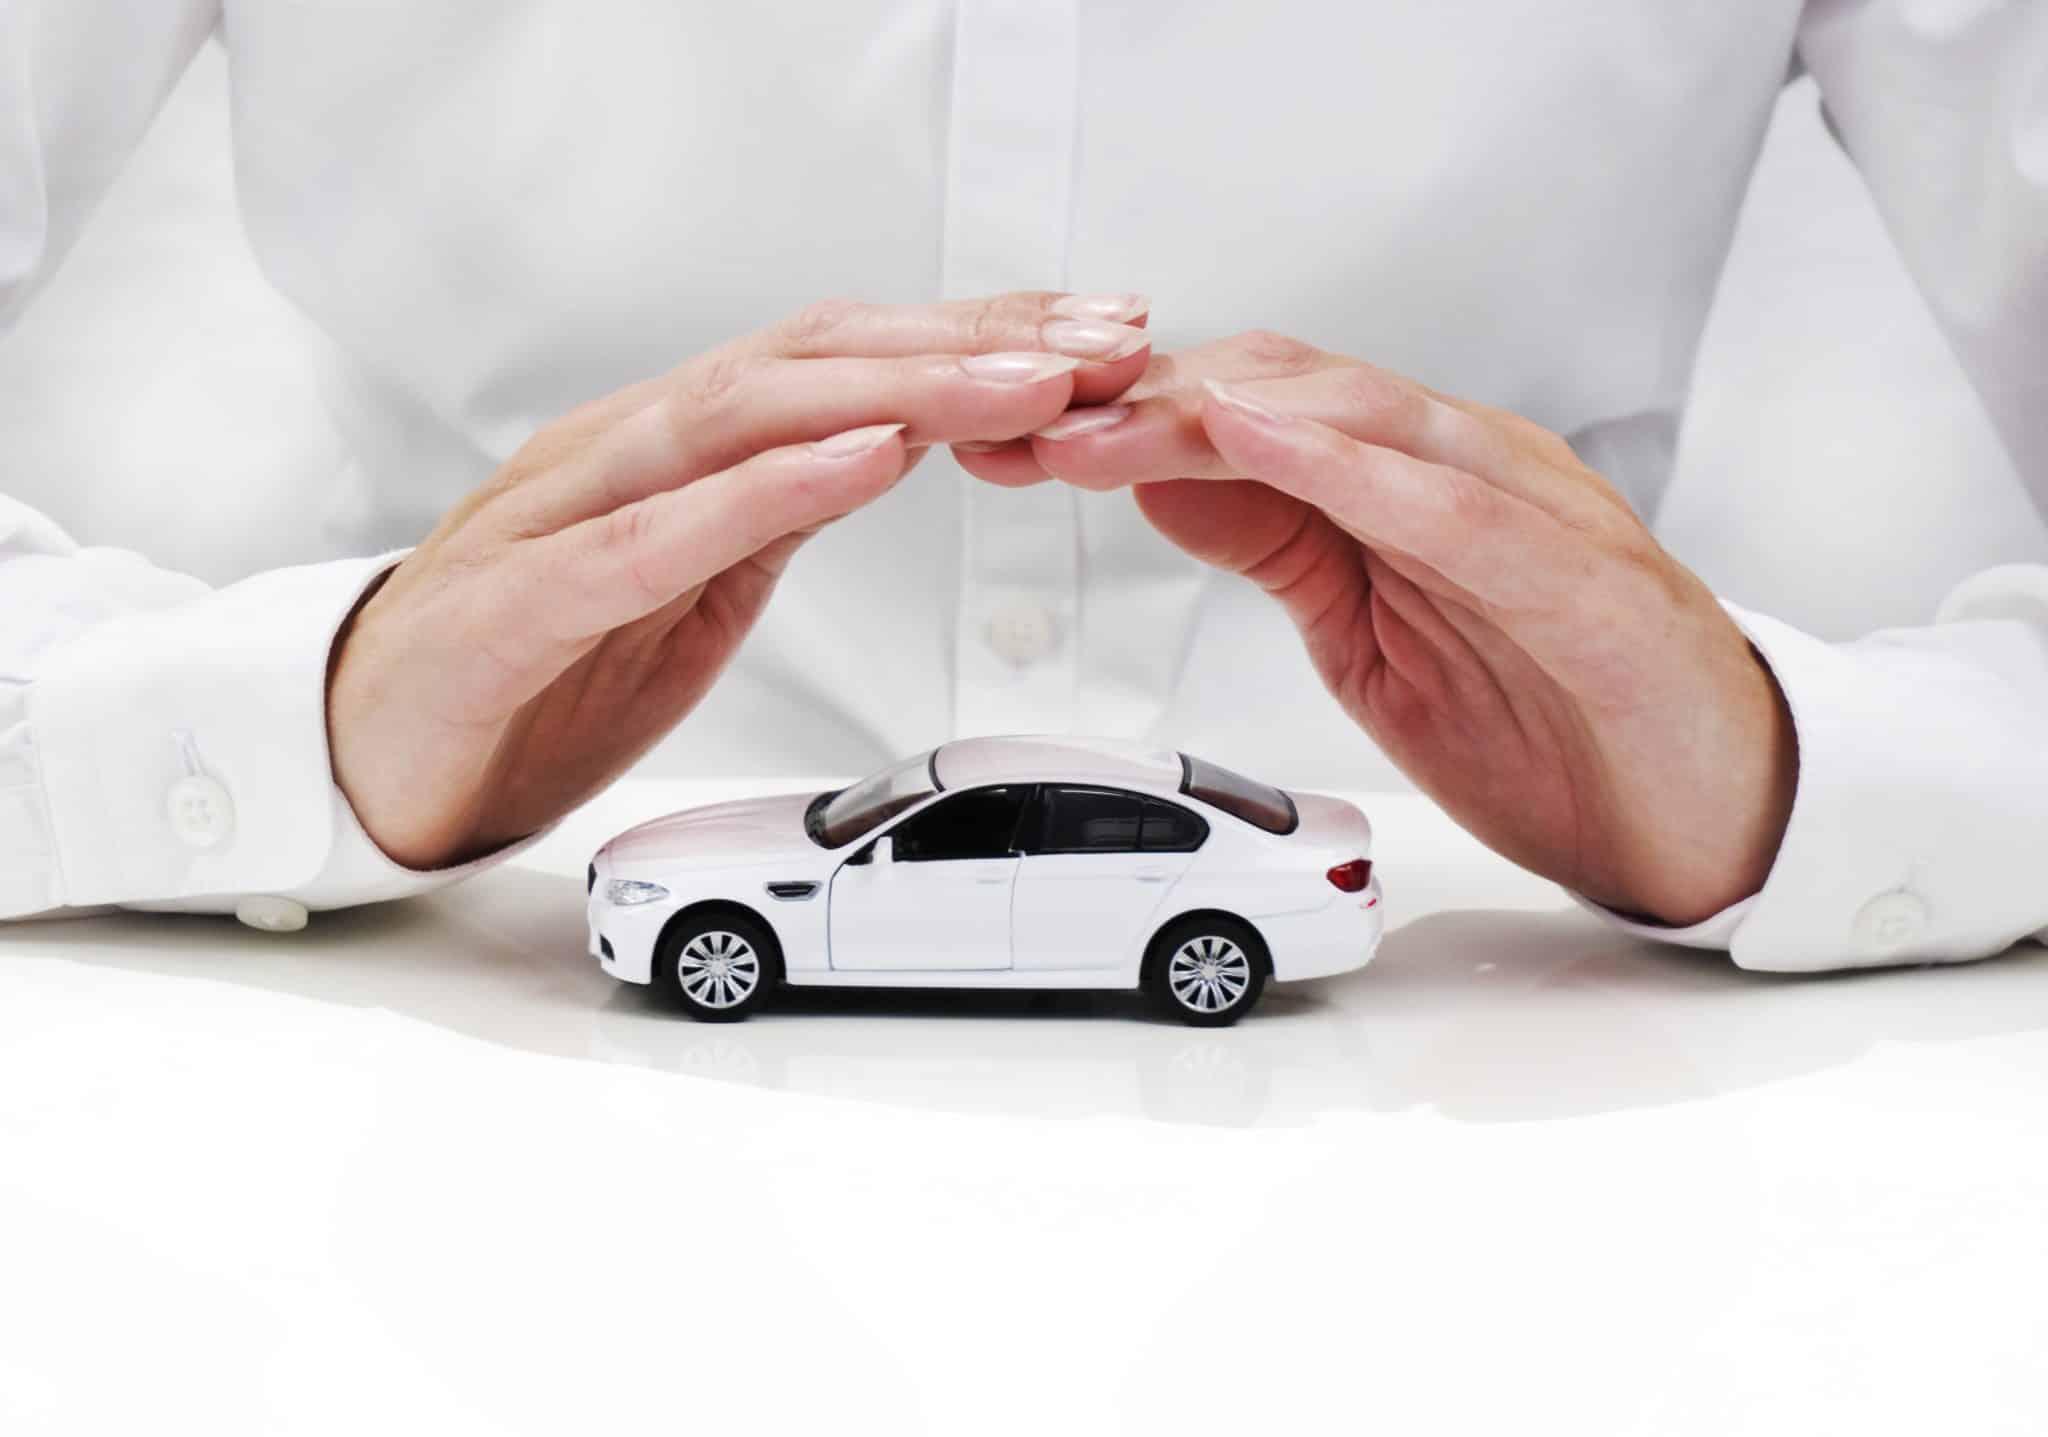 bảo hiểm nuôi xe vios